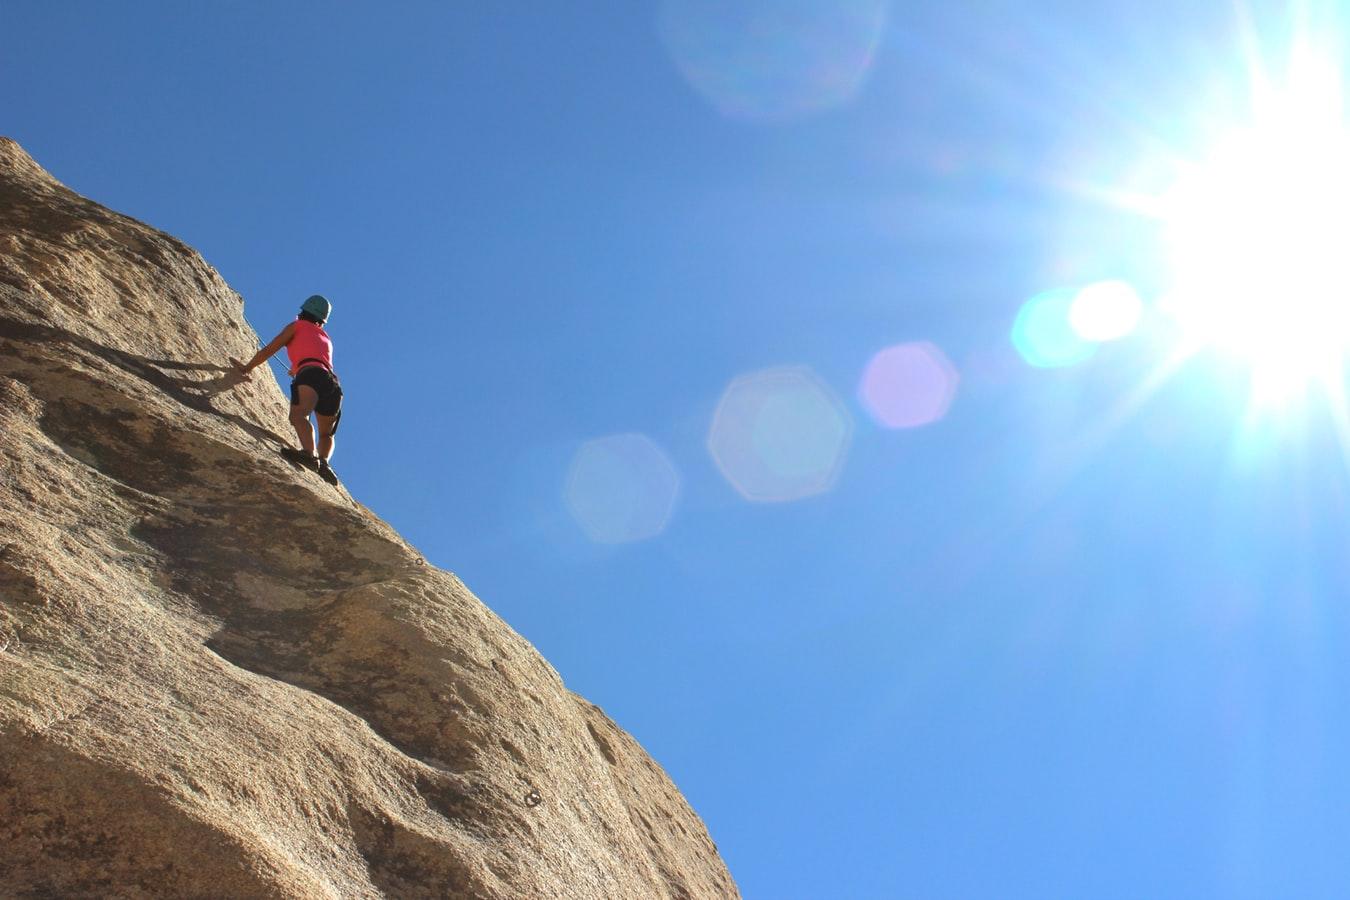 cliff climbing girl